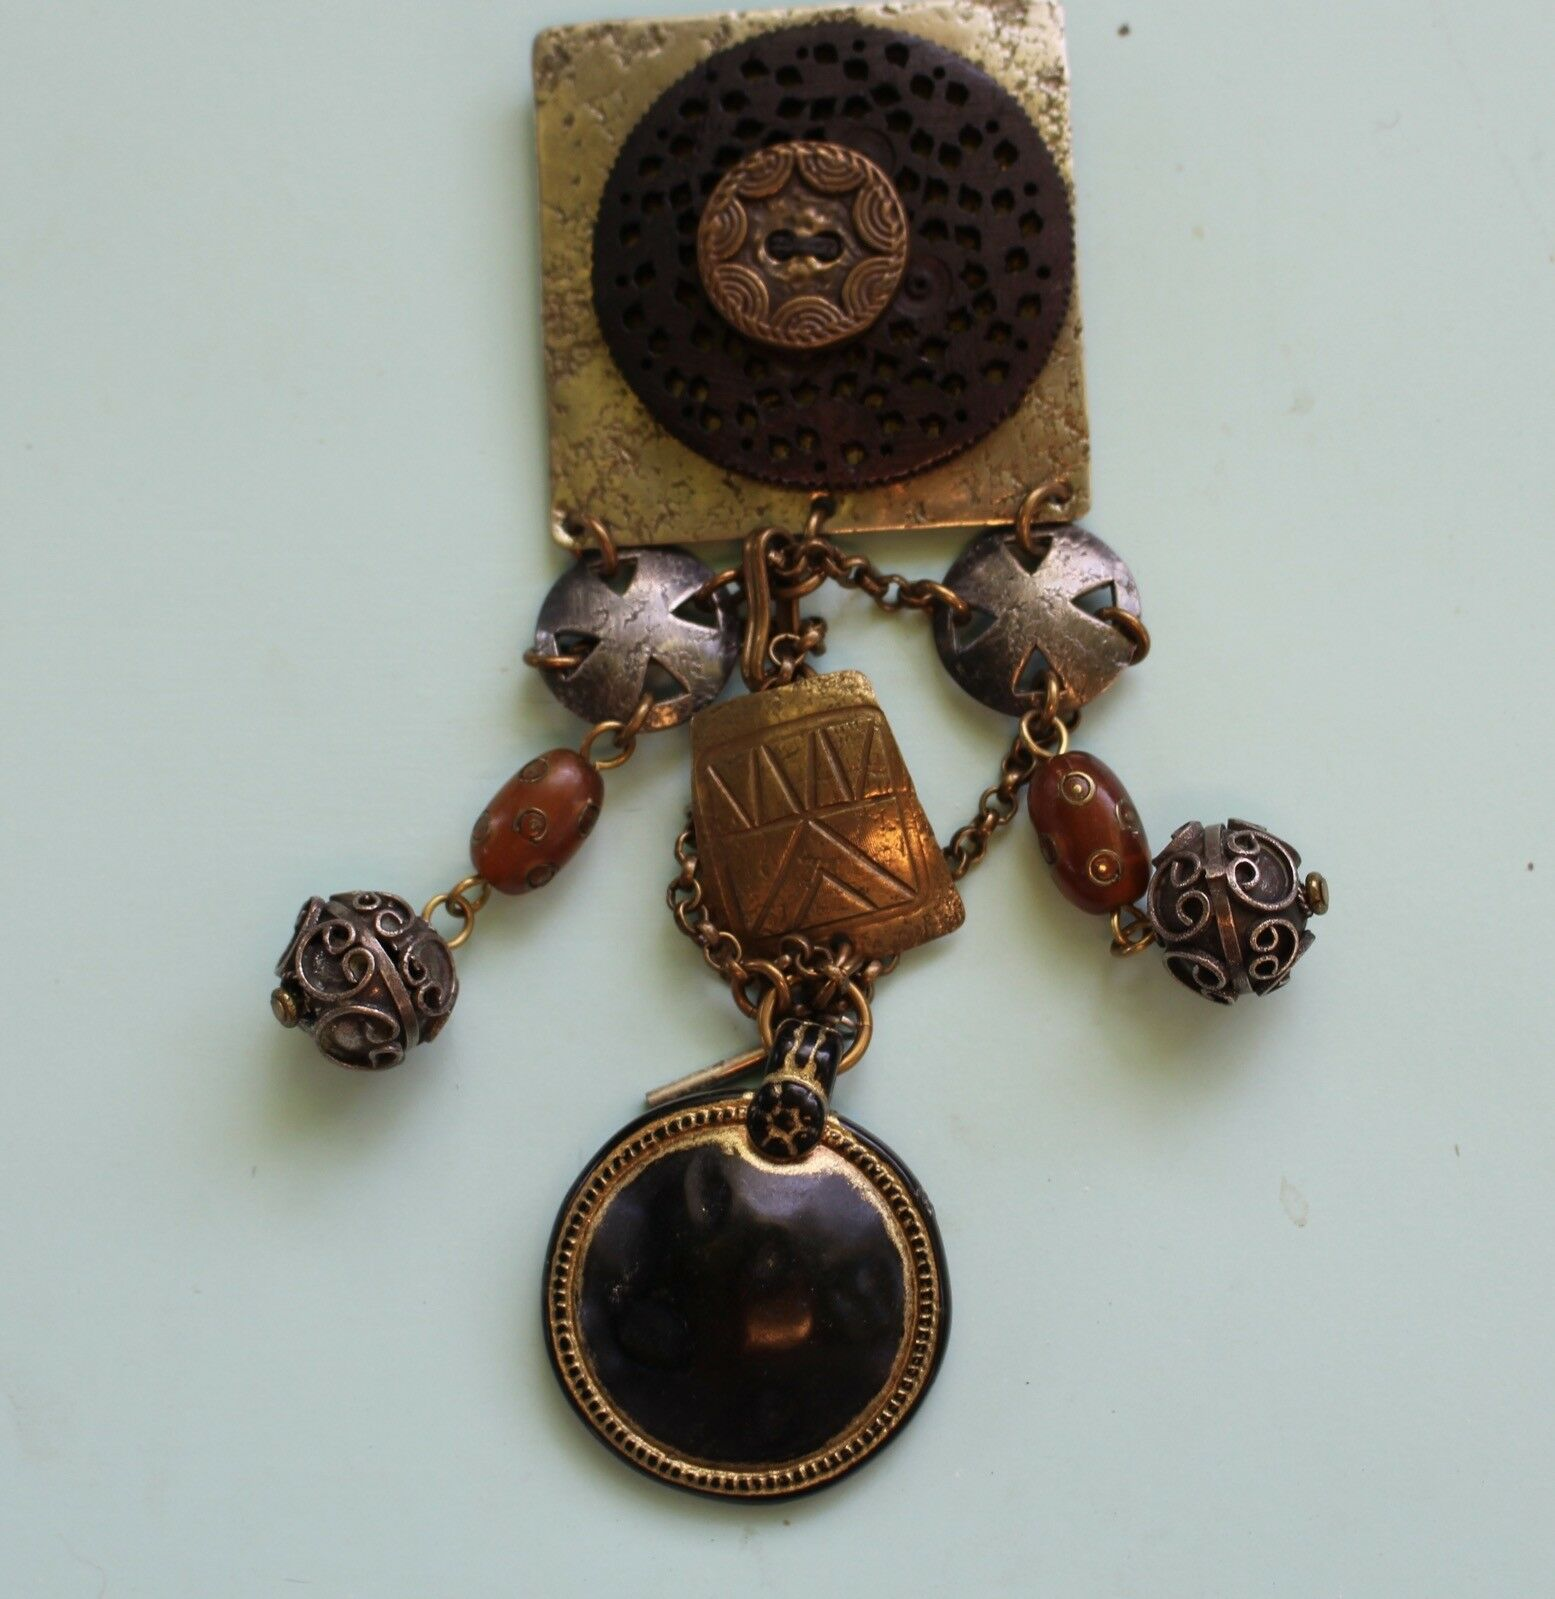 Rare Vintage Marjorie Baer SF Pin Dangle Brooch Signed Designer Costume Jewelry